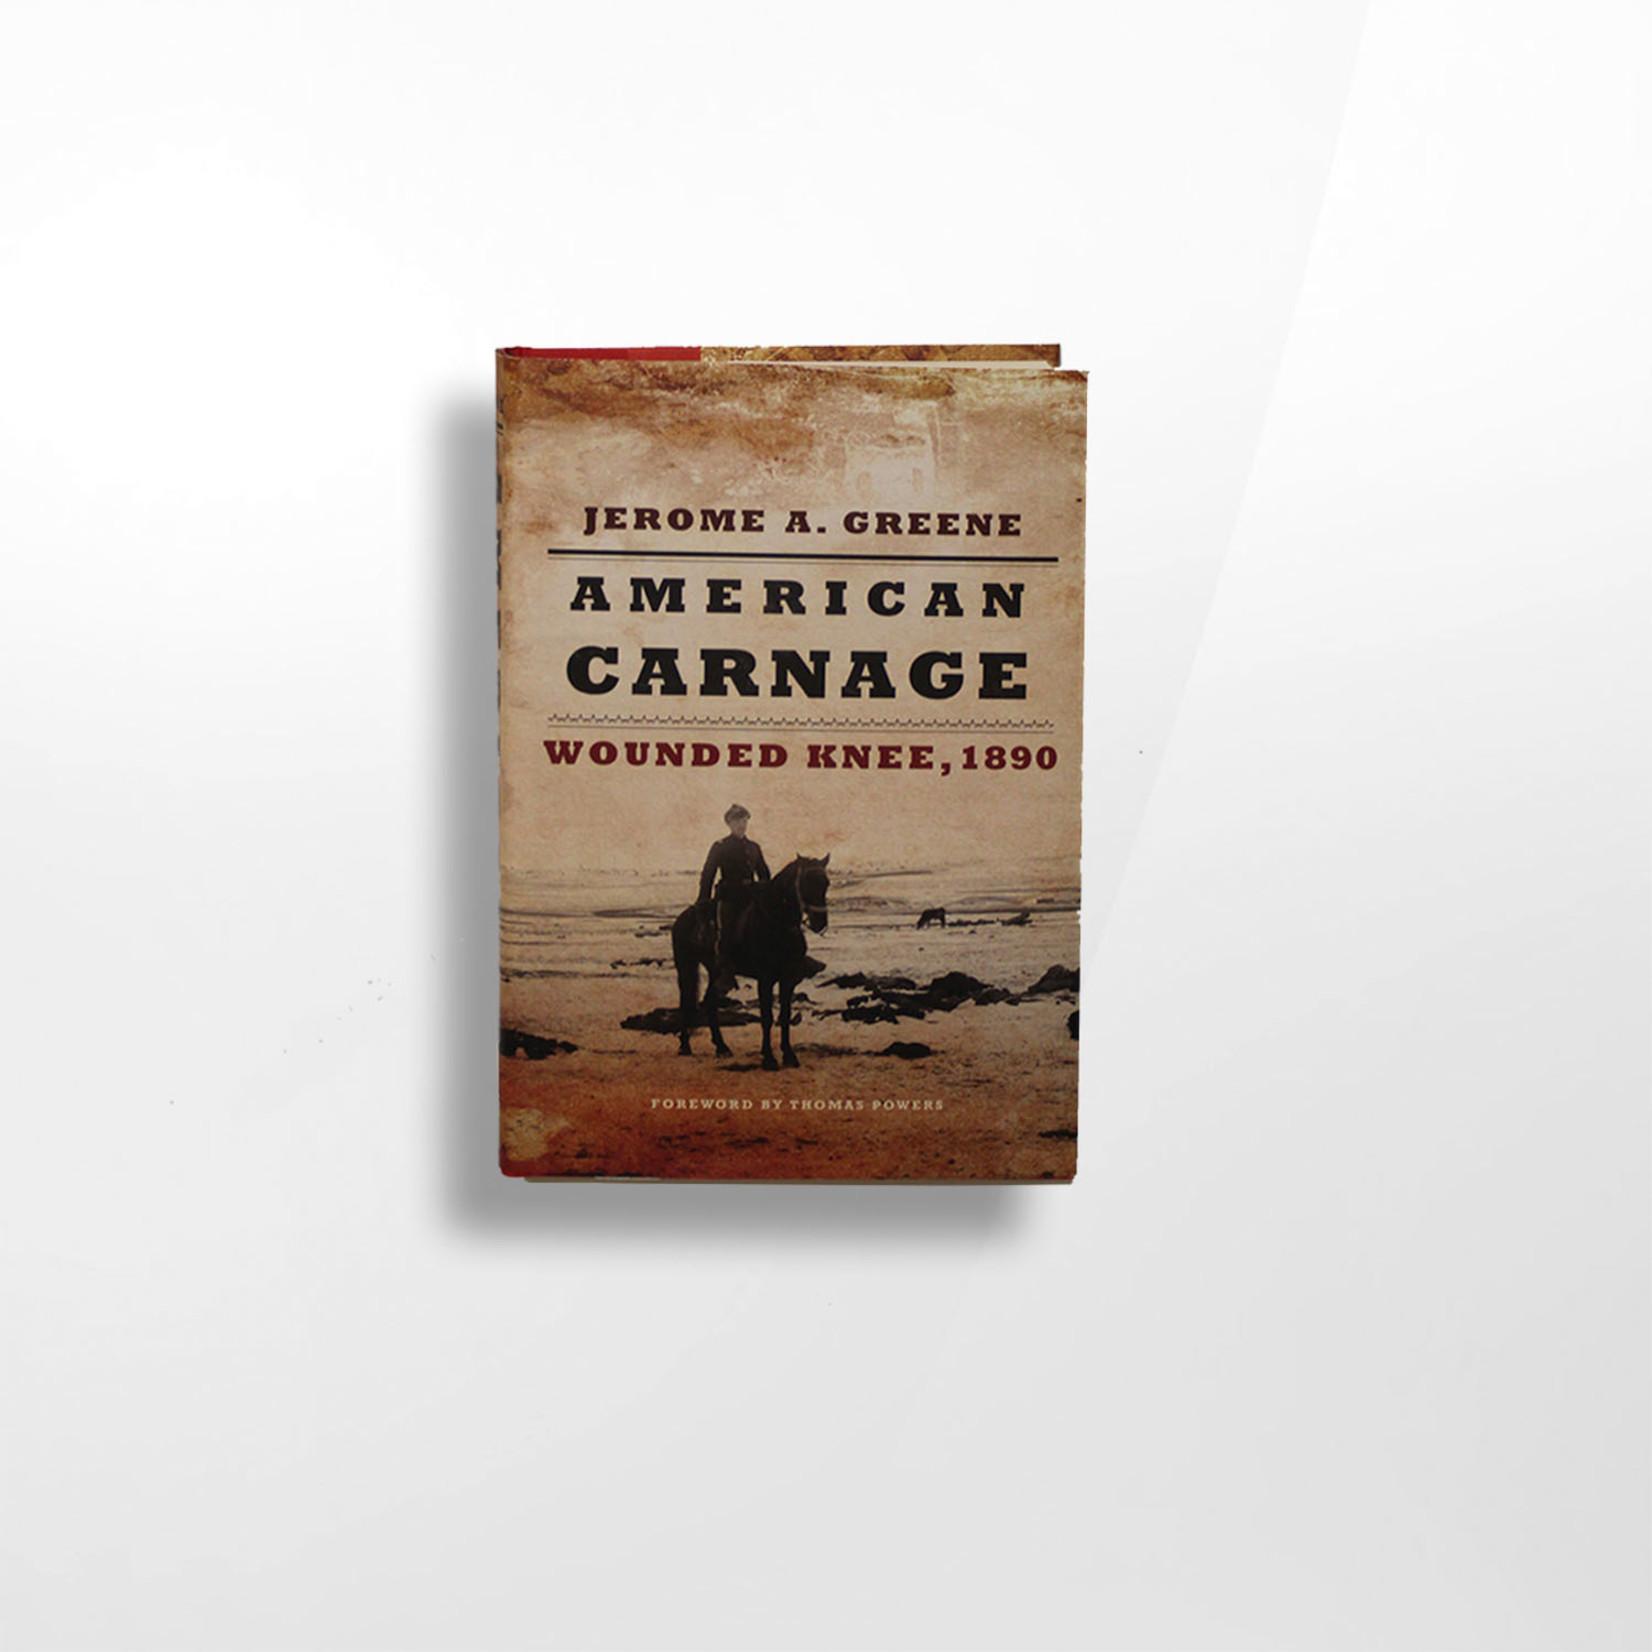 Ingram American Carnage, Wounded Knee, 1890